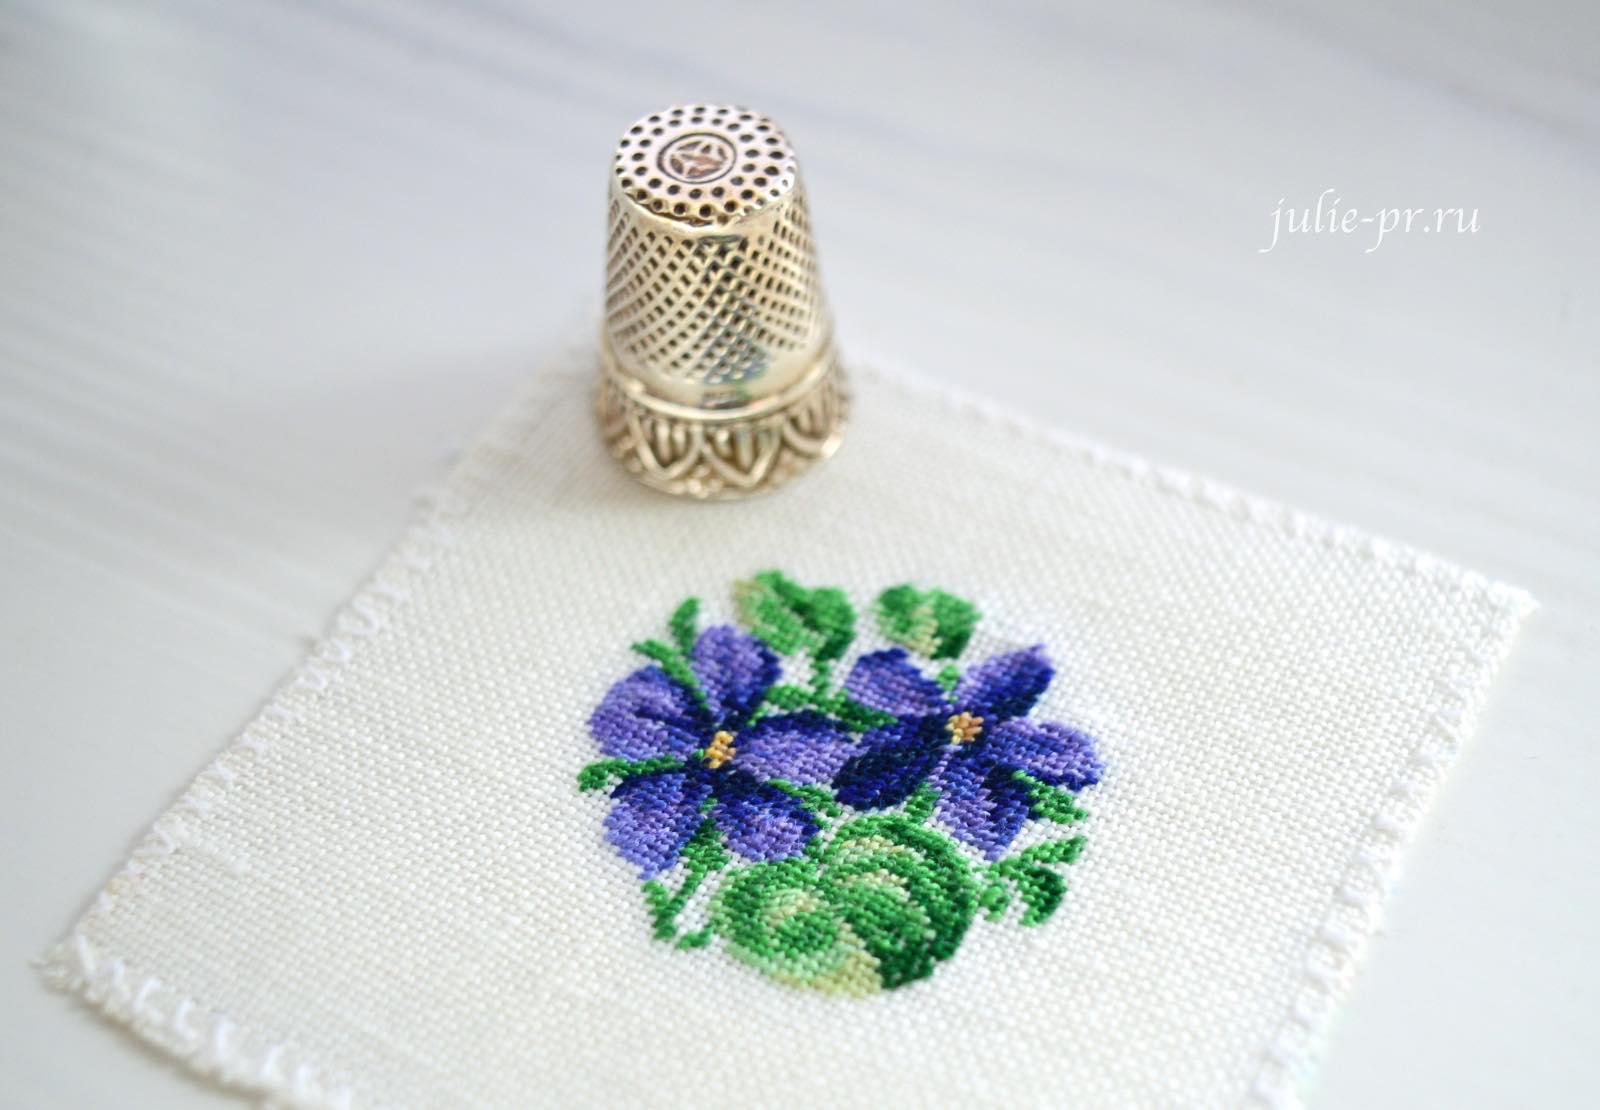 LB-Accessories (Life is beautiful), кулон фиалки, вышивка крестом, вышивка петитом, вышивка petit points